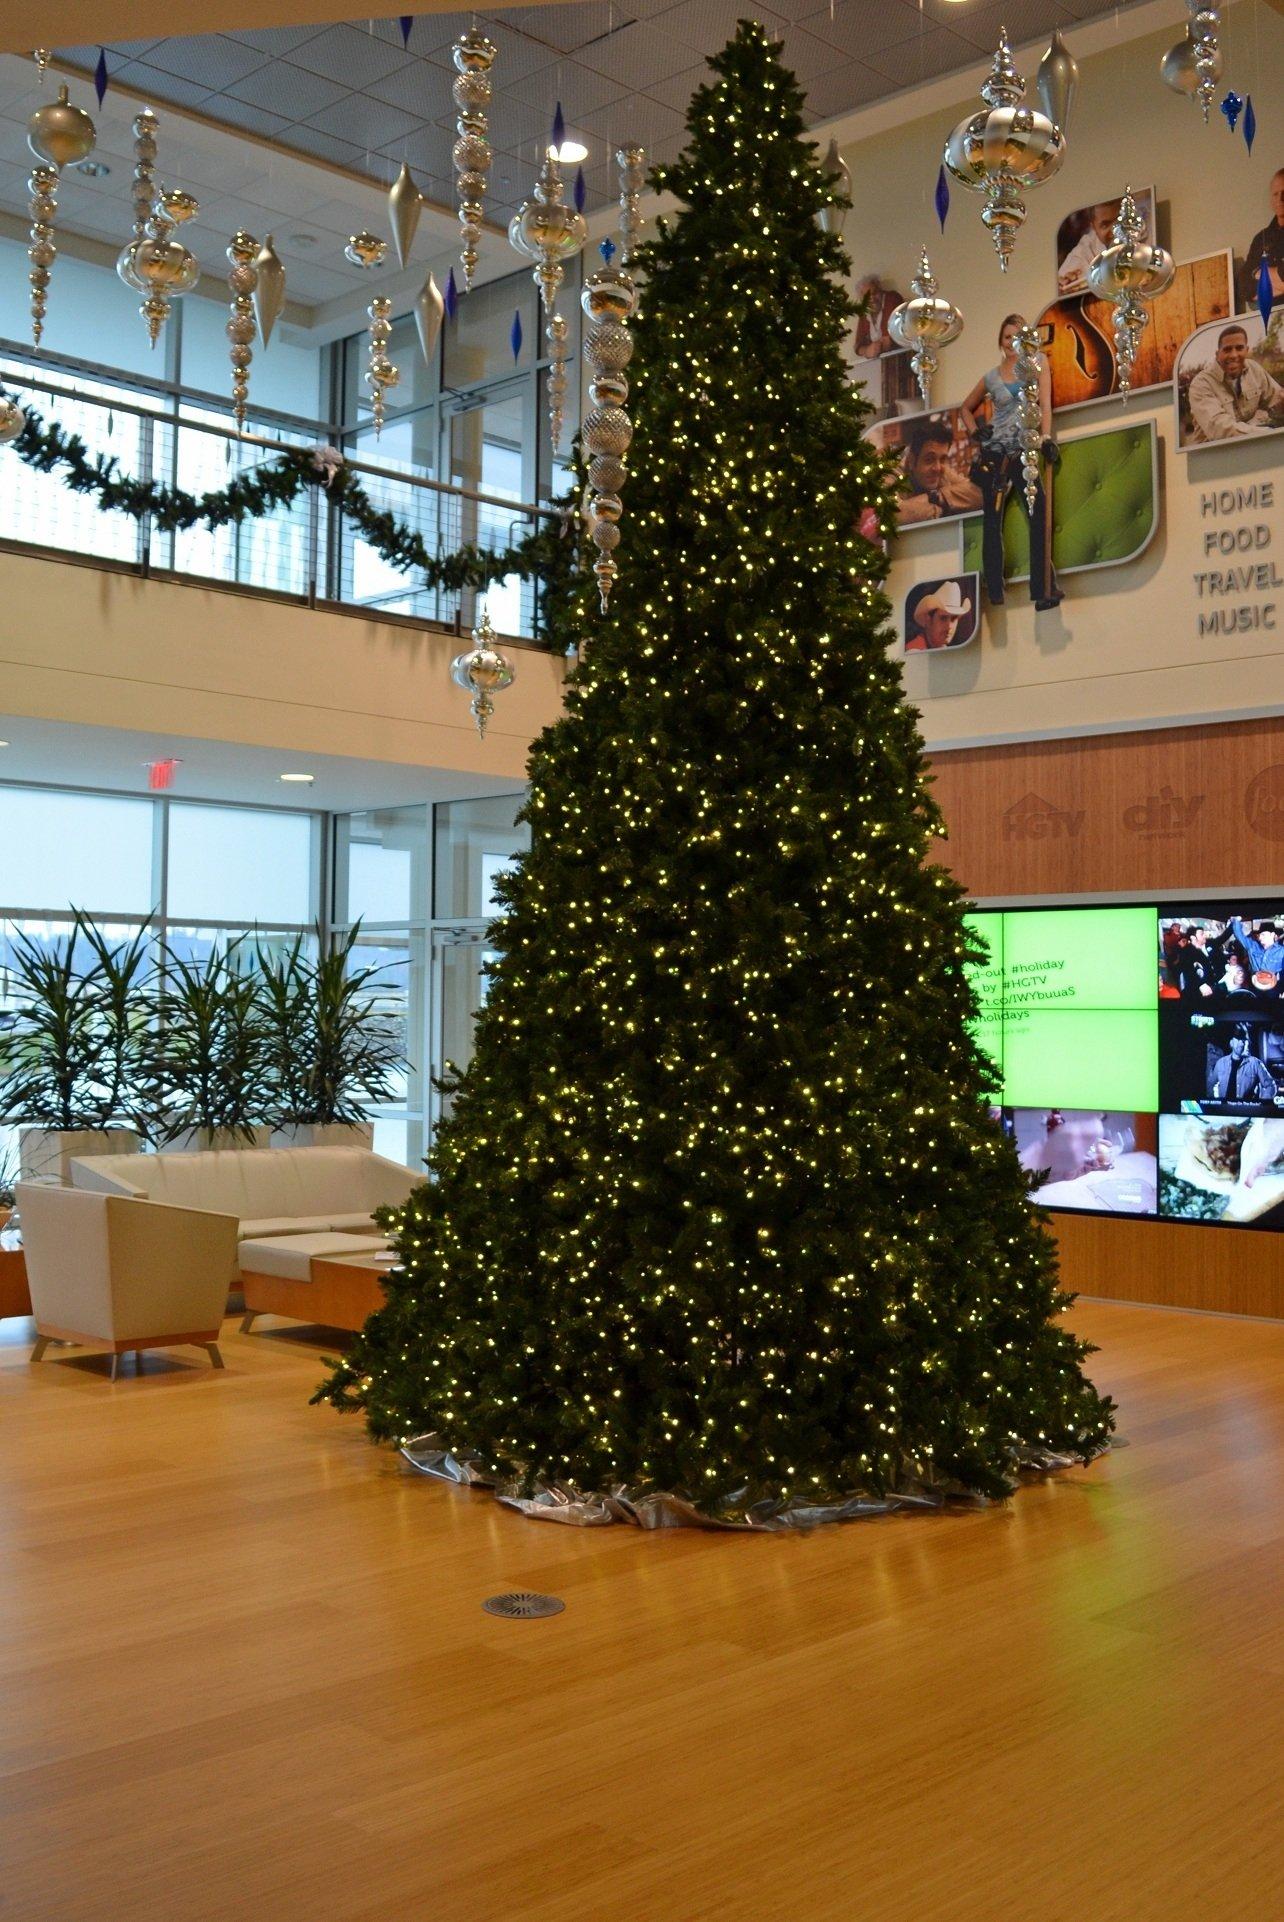 10 Attractive Hgtv Christmas Tree Decorating Ideas decorations modern decorated christmas tree beautiful top clipgoo 2020